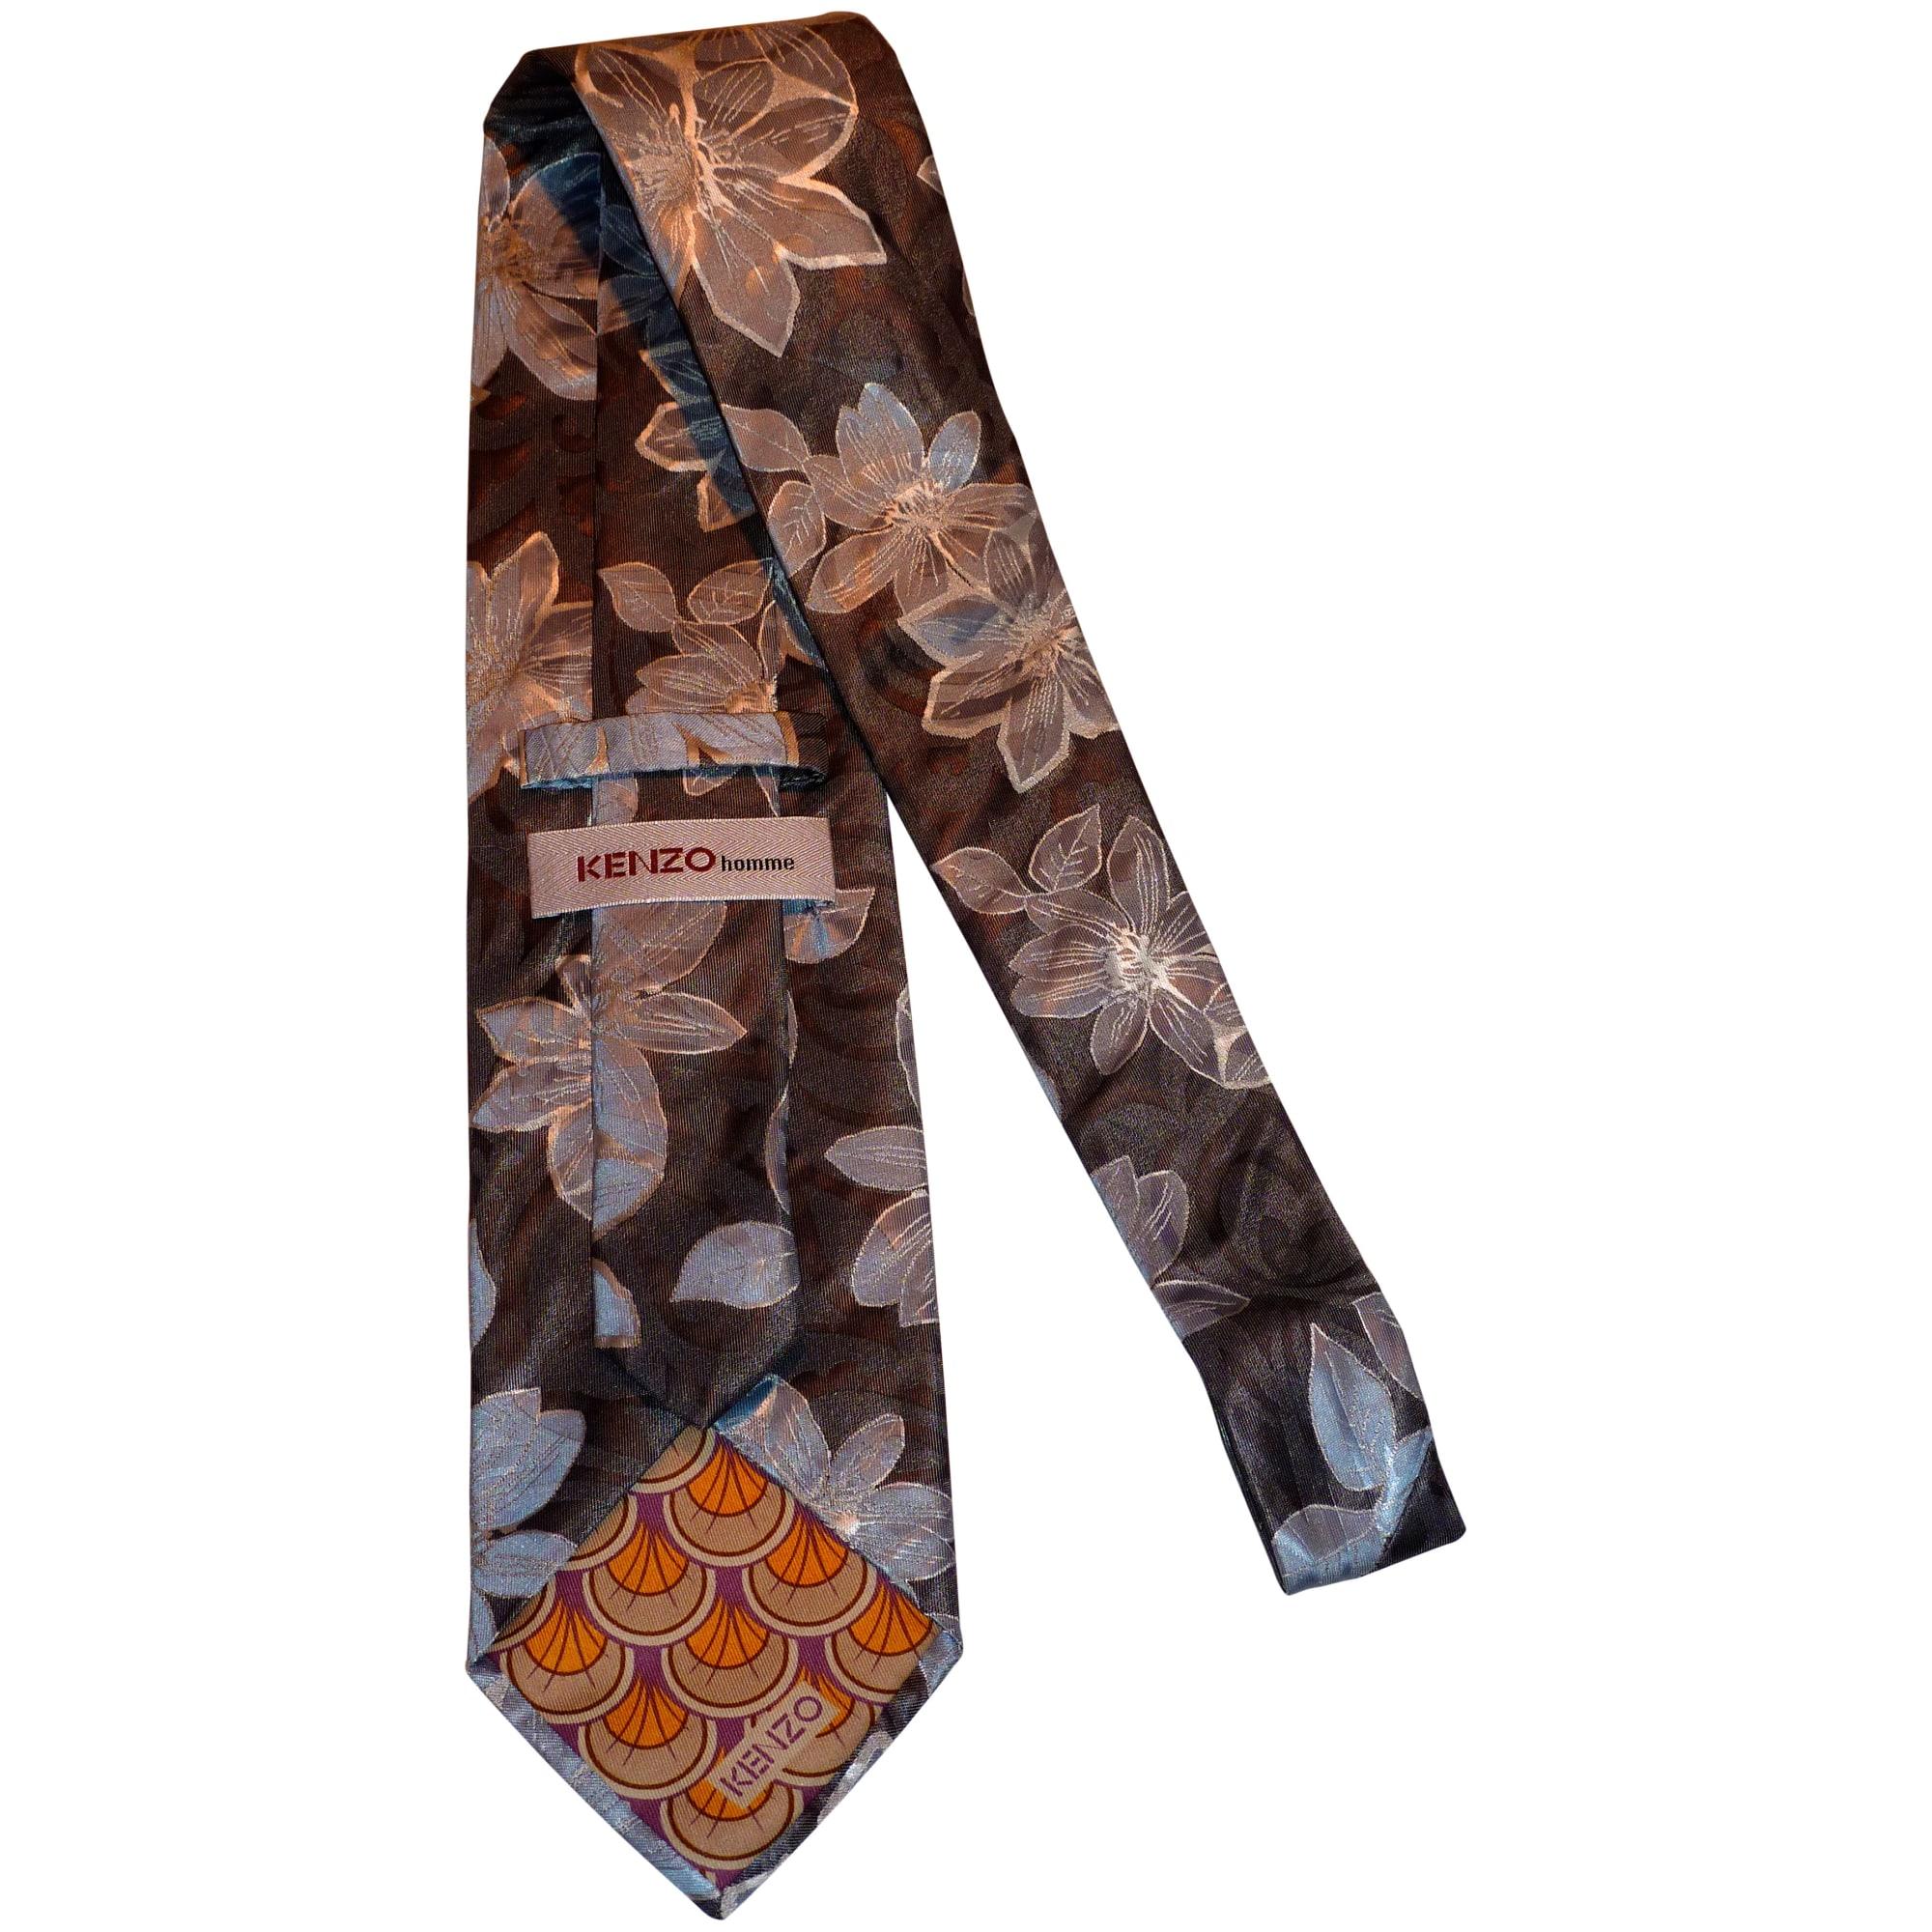 09d2985780df Cravate KENZO gris vendu par  may 495574 - 1764569